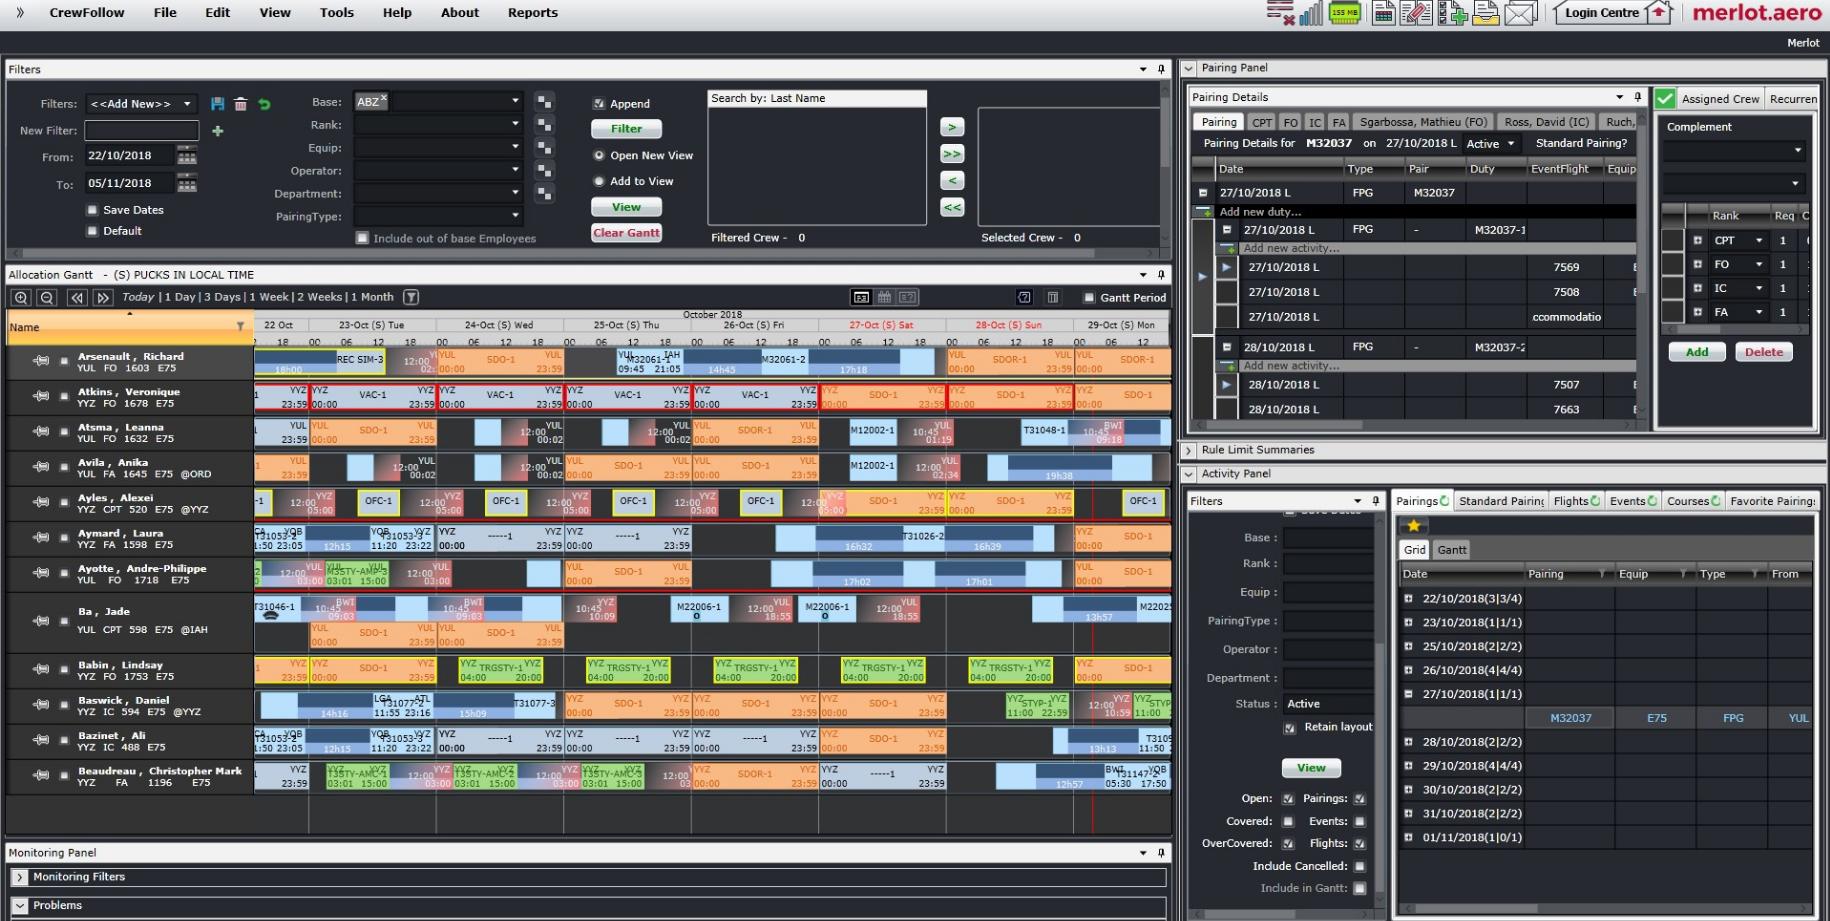 Crew planning system dashboard